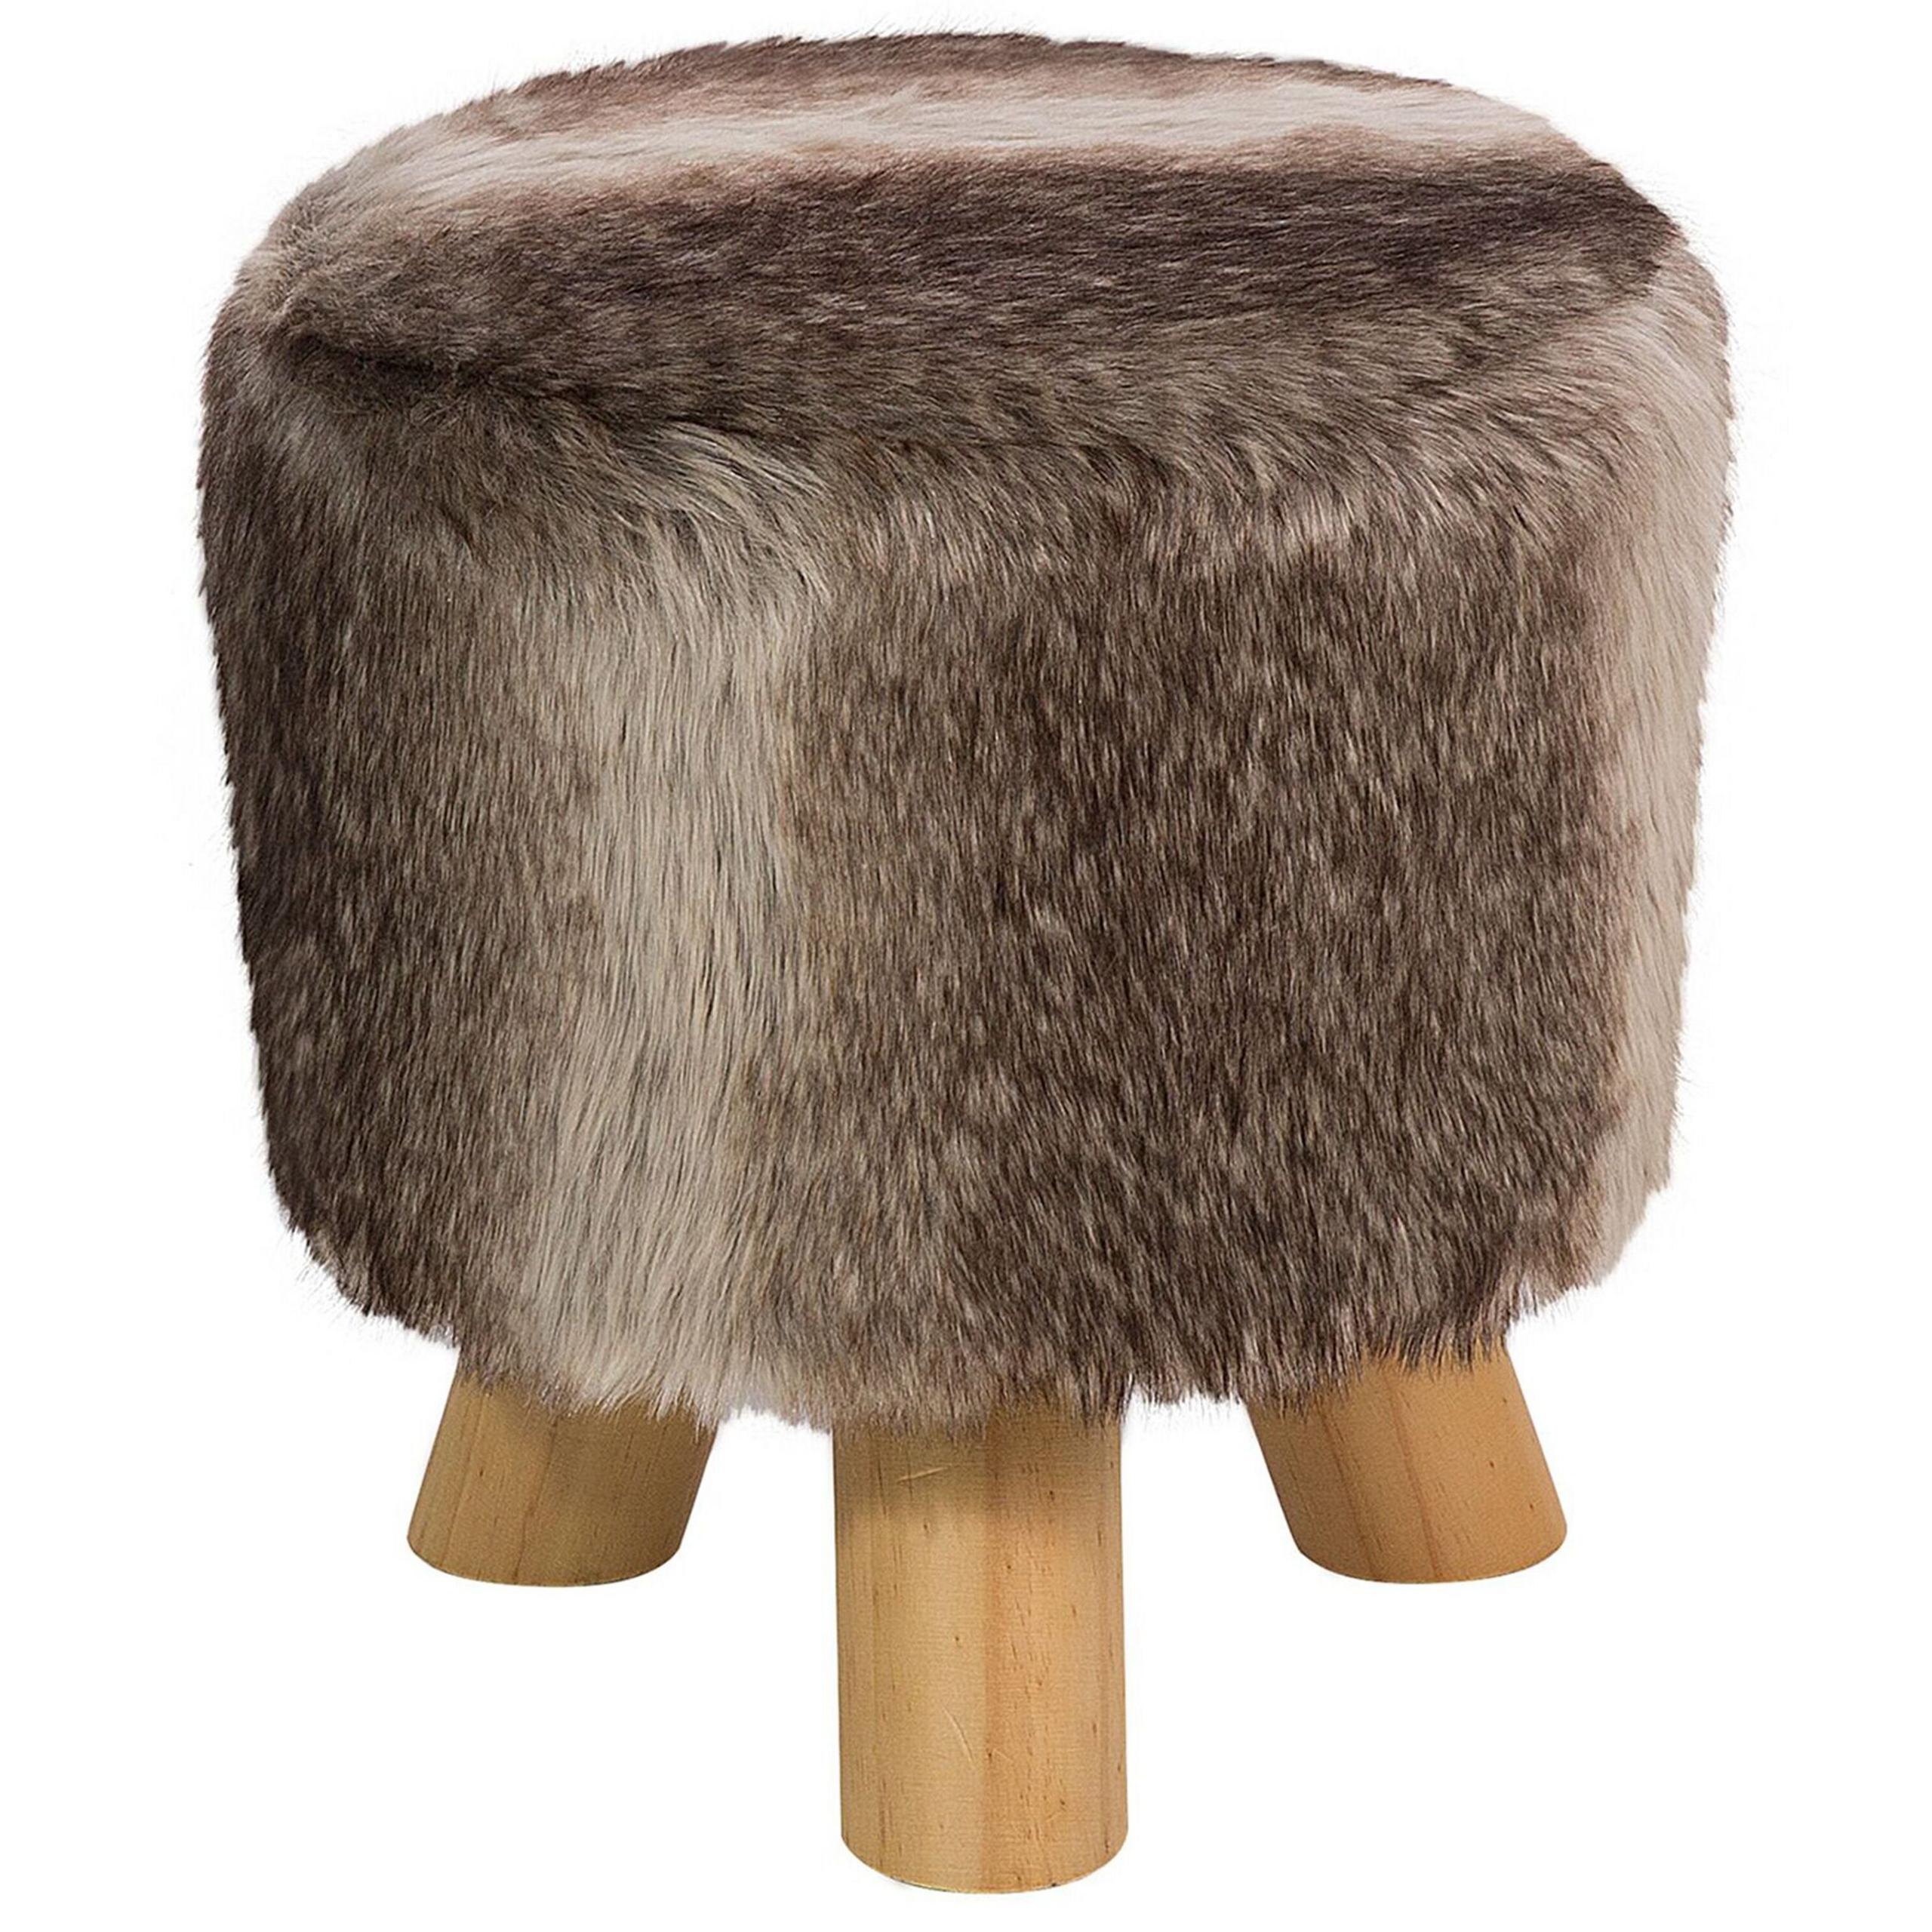 Beliani Footstool Brown and Beige Faux Fur Round Shaggy Stool on Tripod Legs